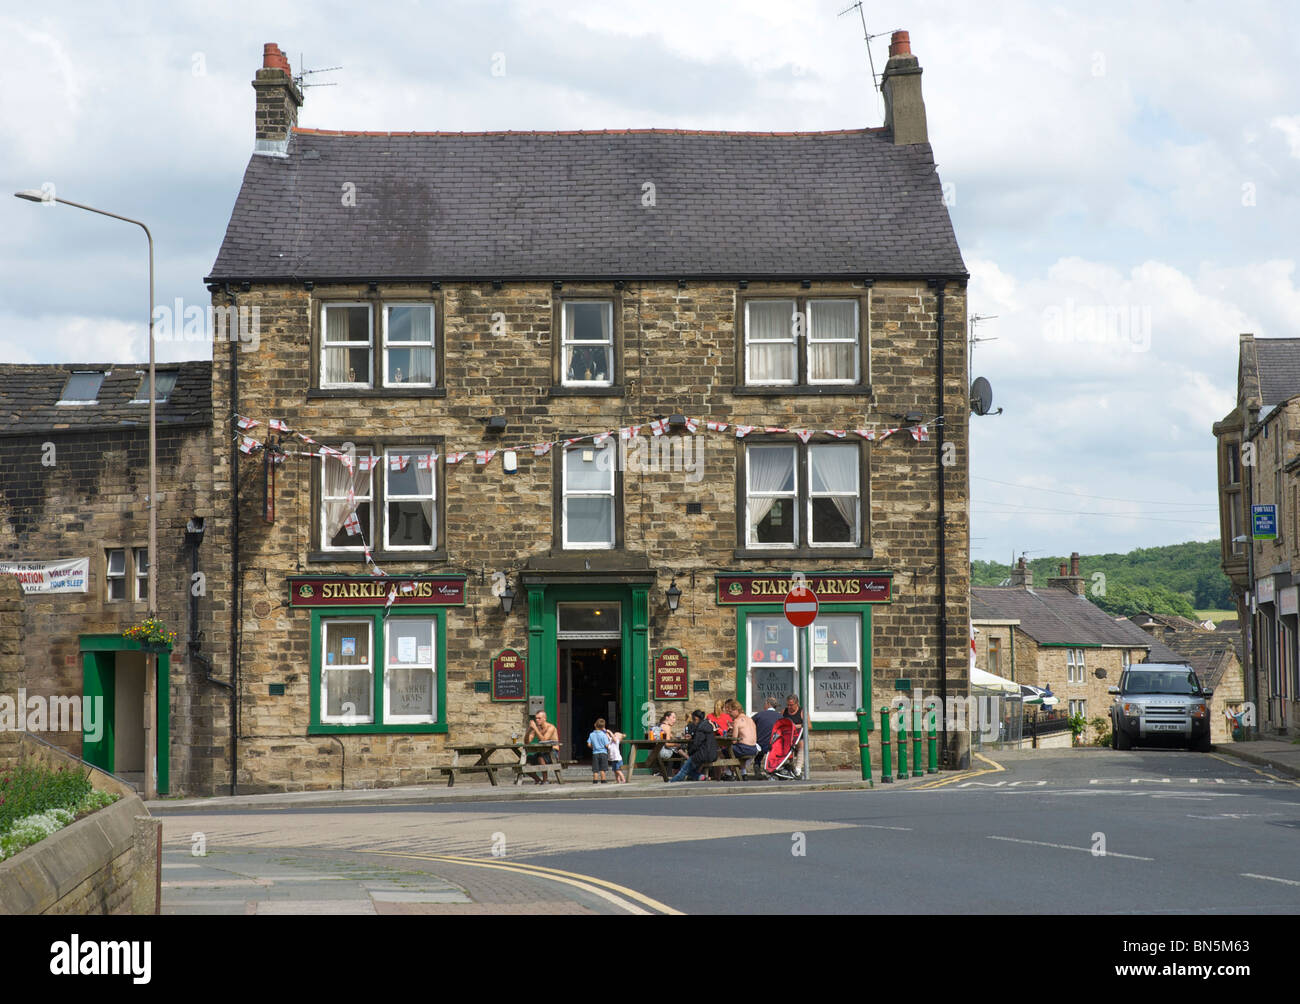 Local pub - the Starkie Arms - in Padiham, Lancashire, England UK - Stock Image